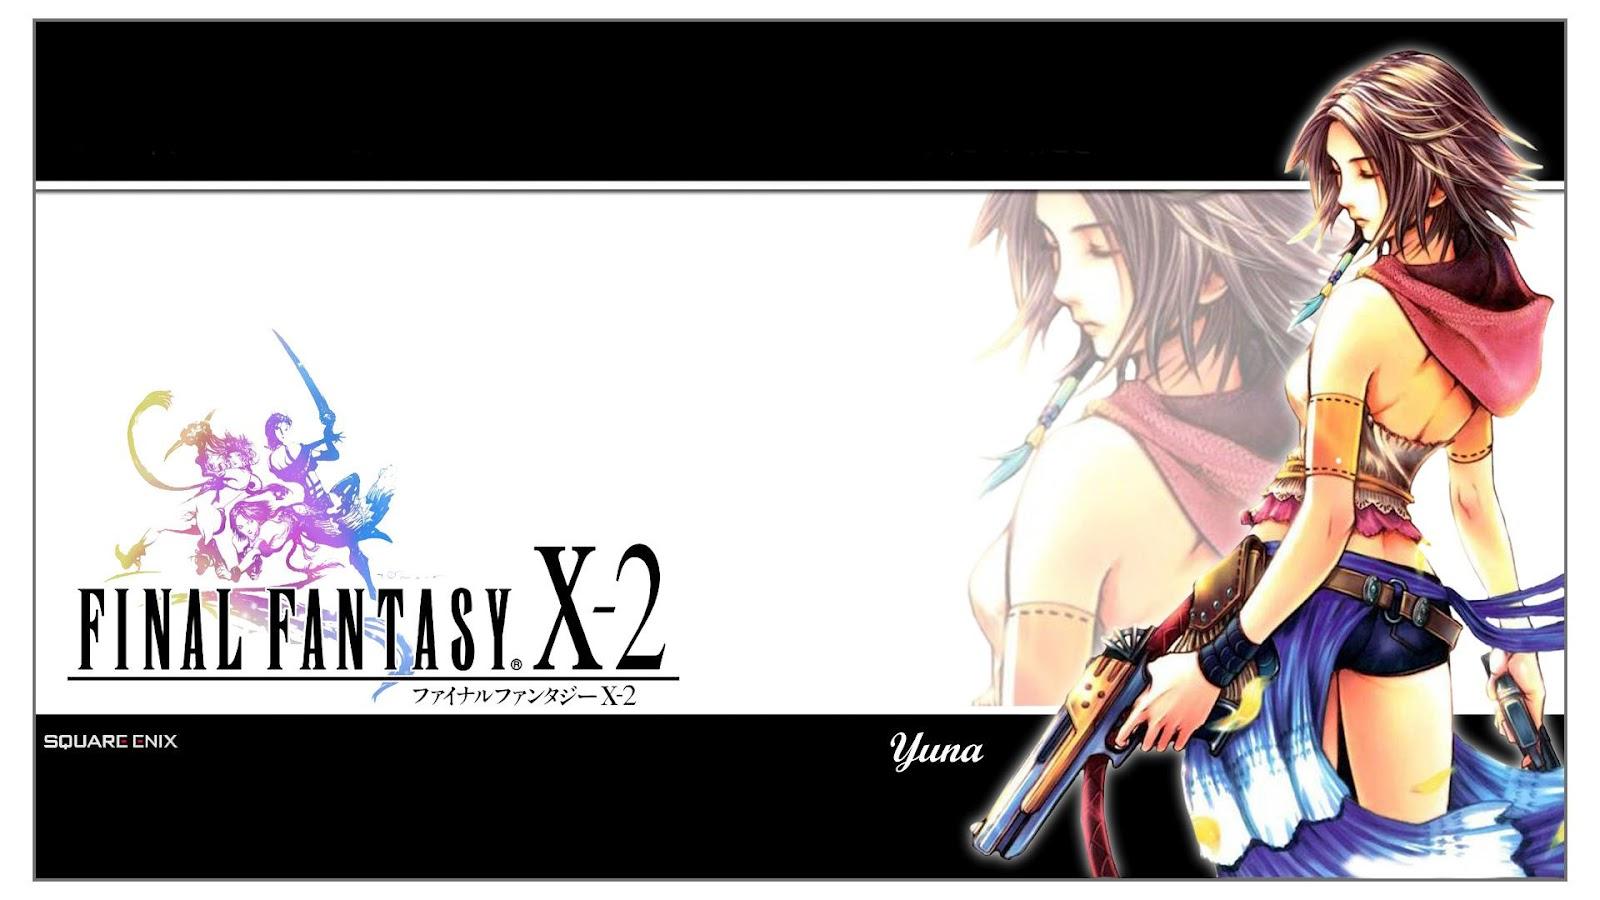 http://2.bp.blogspot.com/-U9_neGpEC1U/UBT02XH5-gI/AAAAAAAAEc0/tRGe4U1Ld28/s1600/Final+Fantasy+X-2+wallpapers+1.jpg